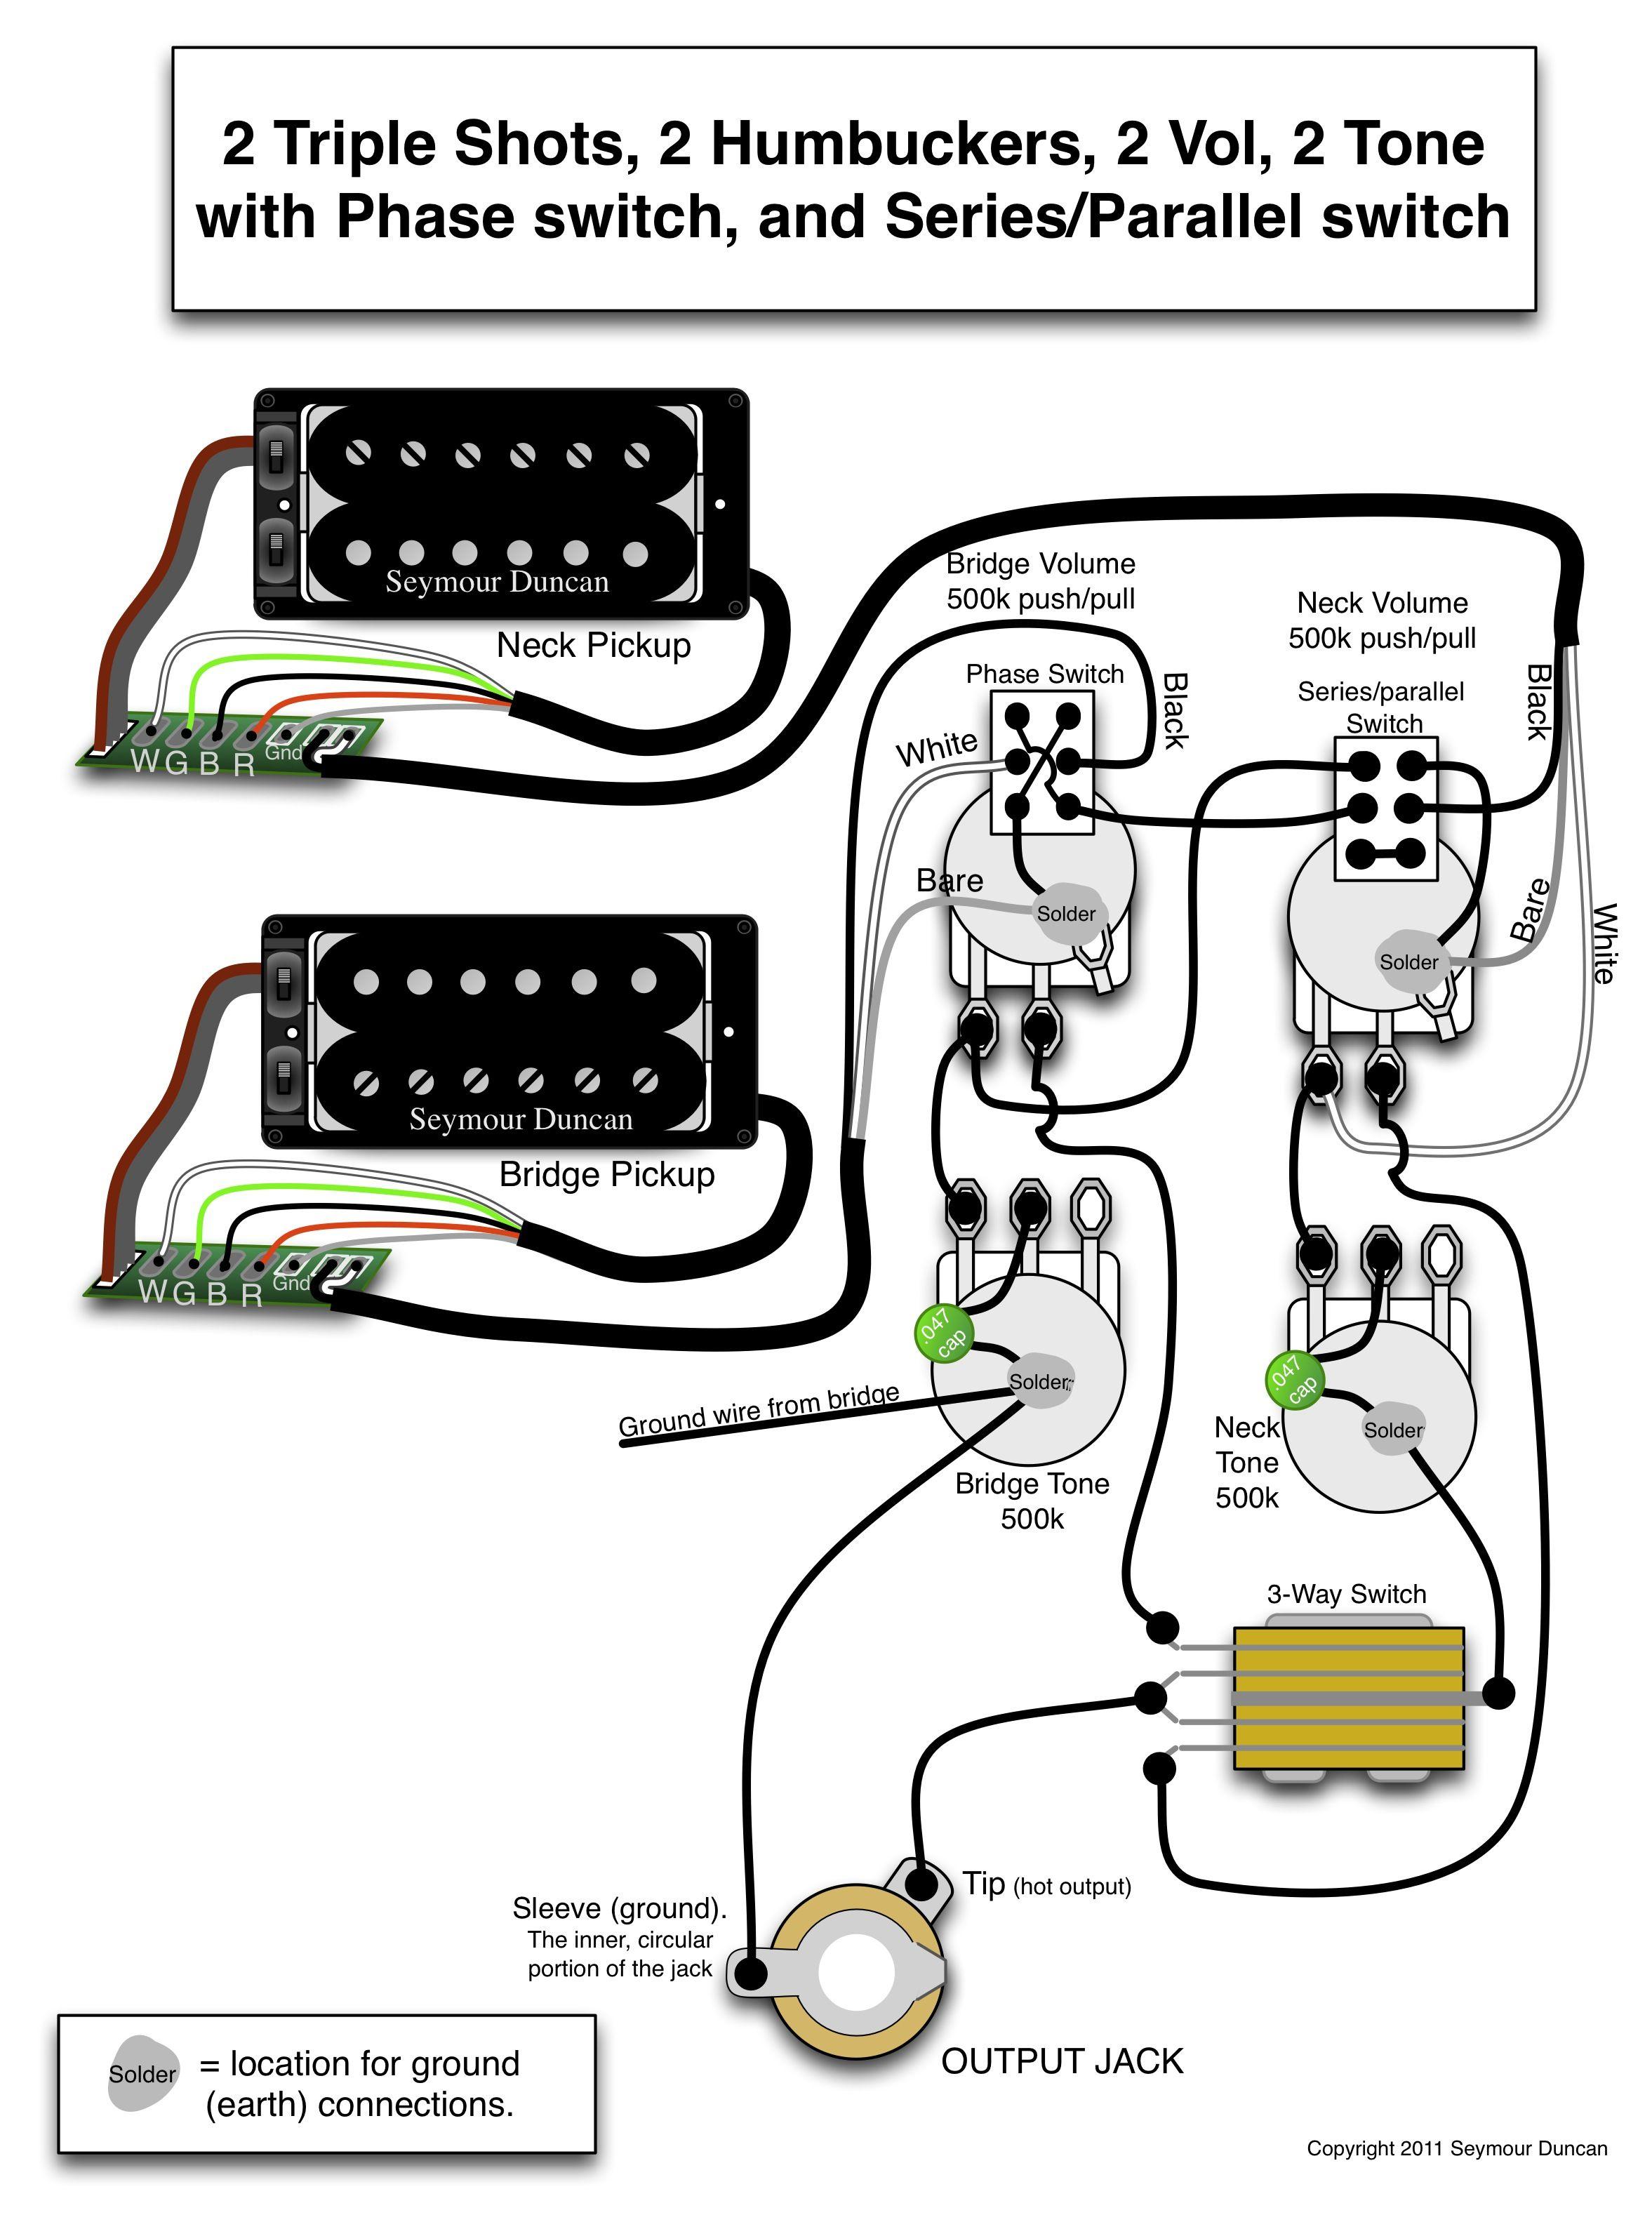 two pickups wiring diagram transformer diagrams single phase seymour duncan 2 triple shots